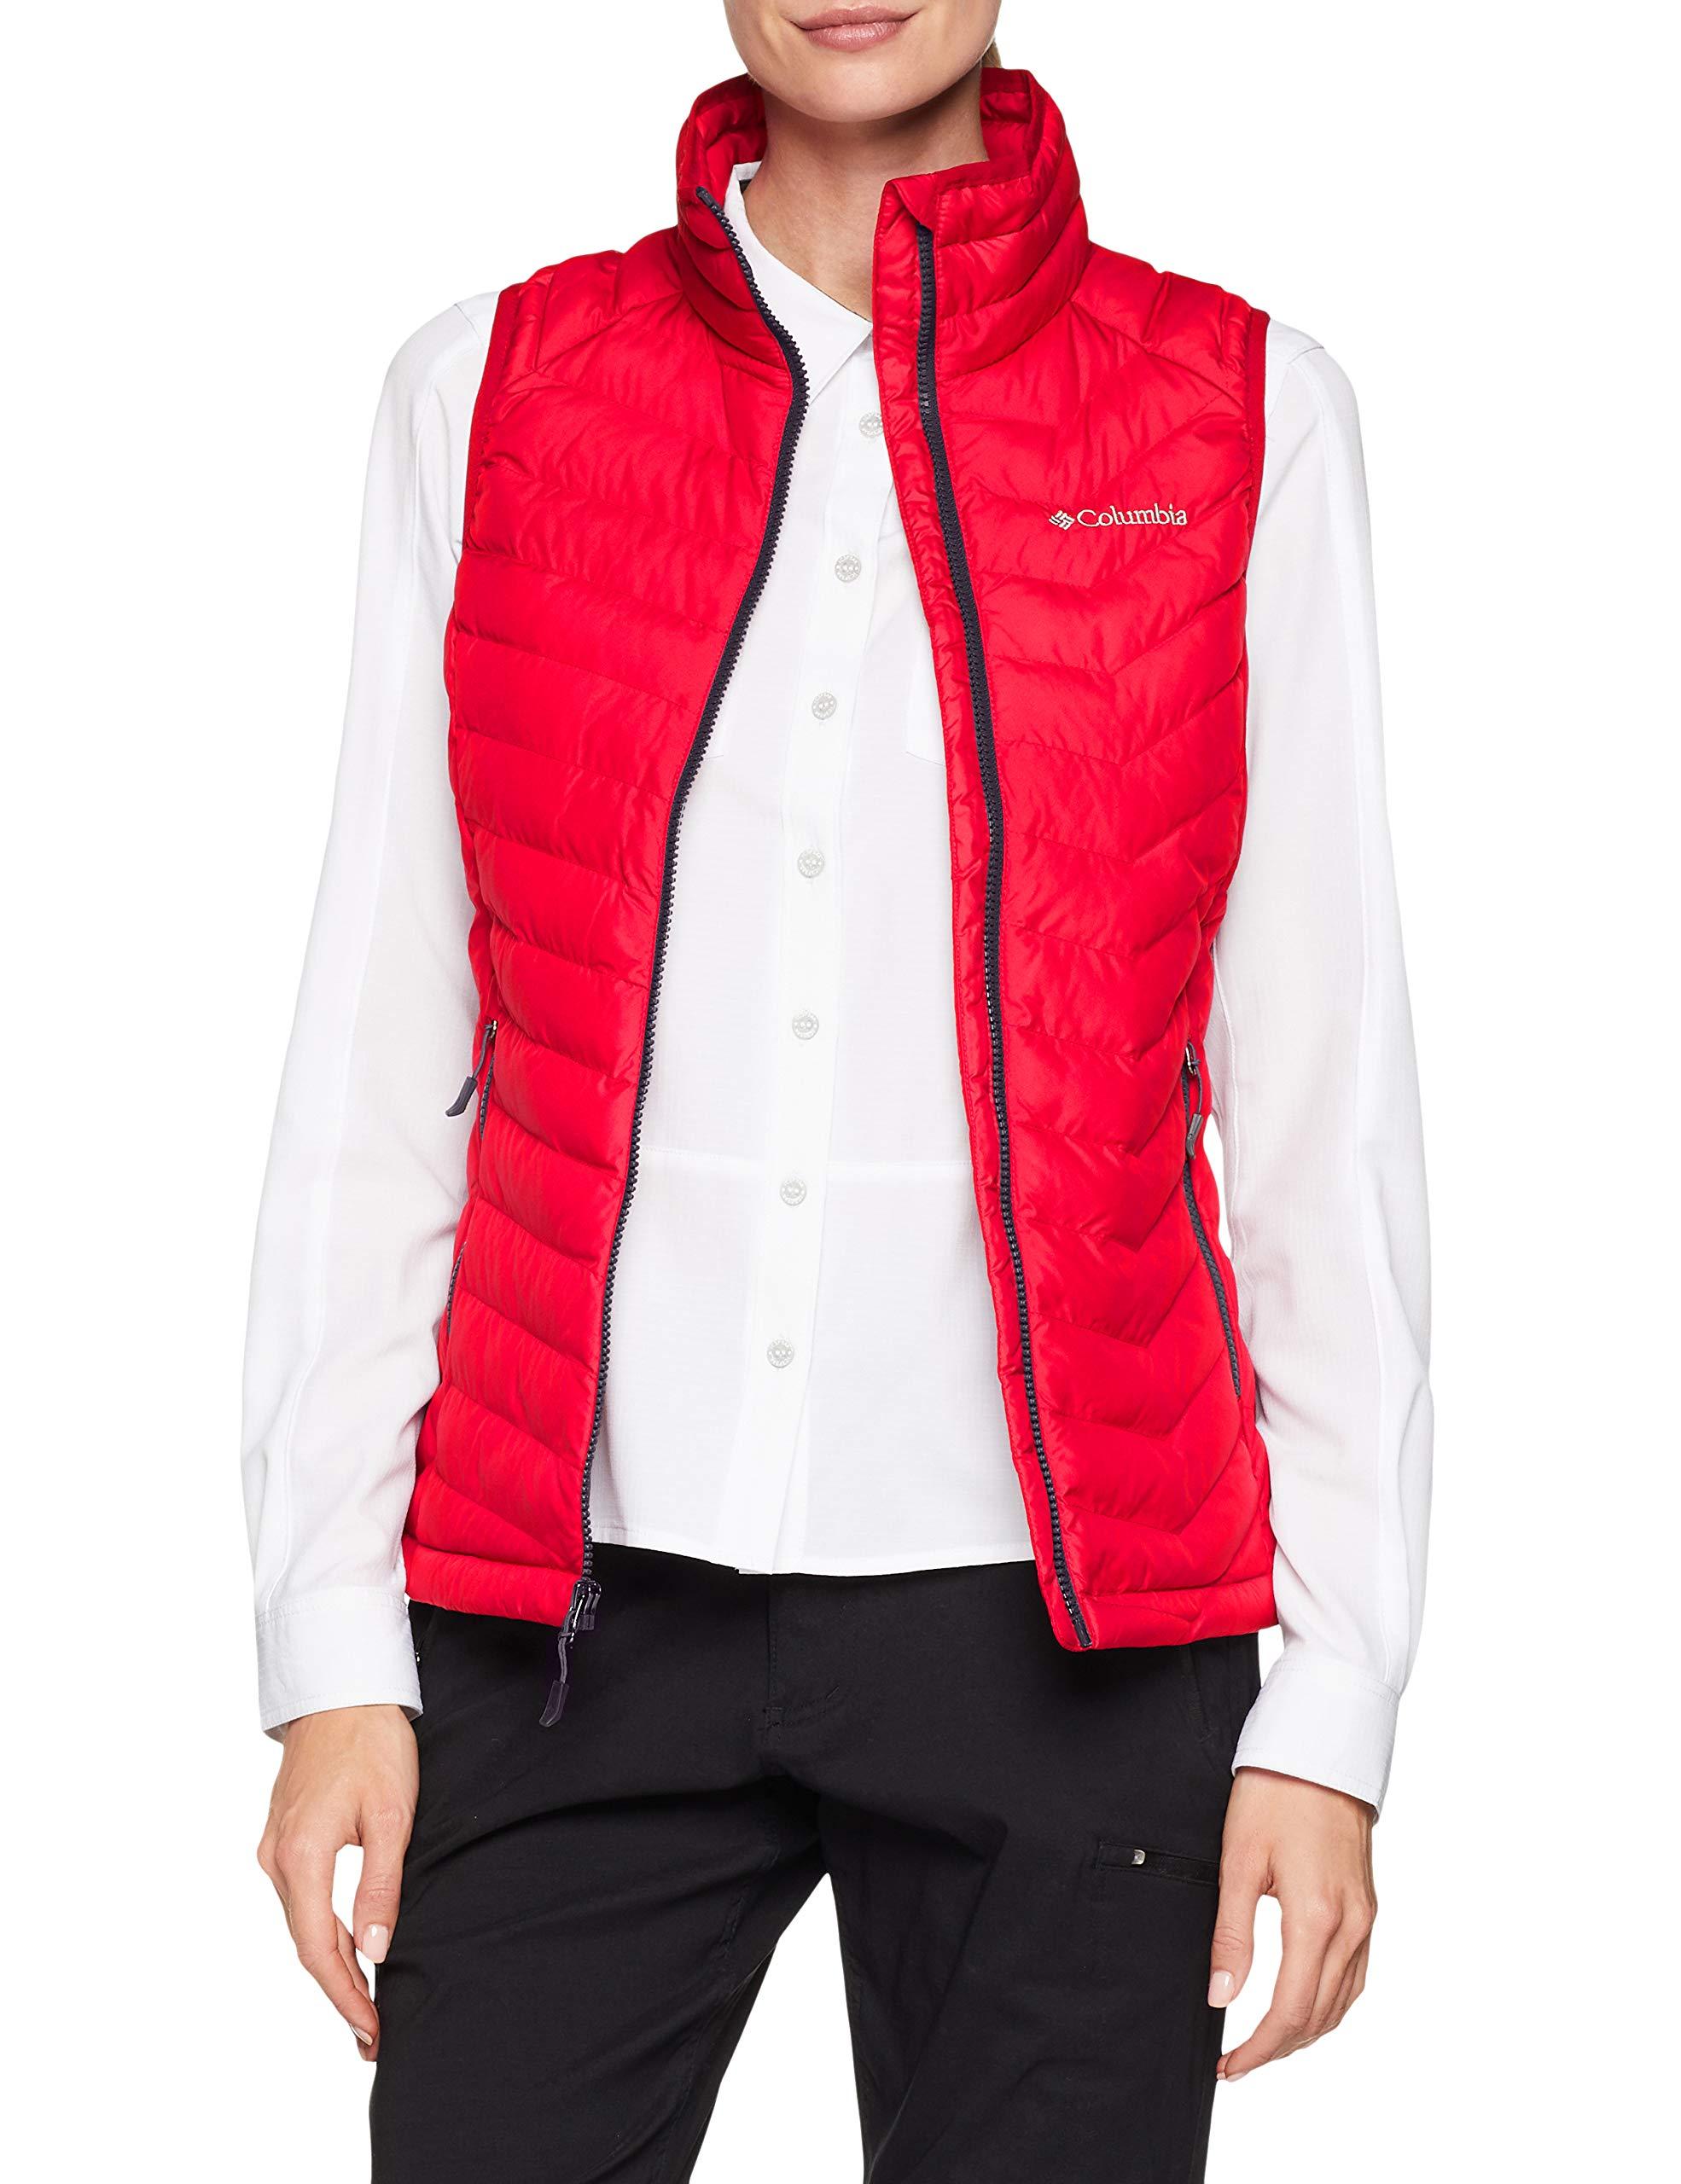 b0e8e518c columbia powder lite vest Columbia Women s Powder Lite Vest Gilet -  UKsportsOutdoors